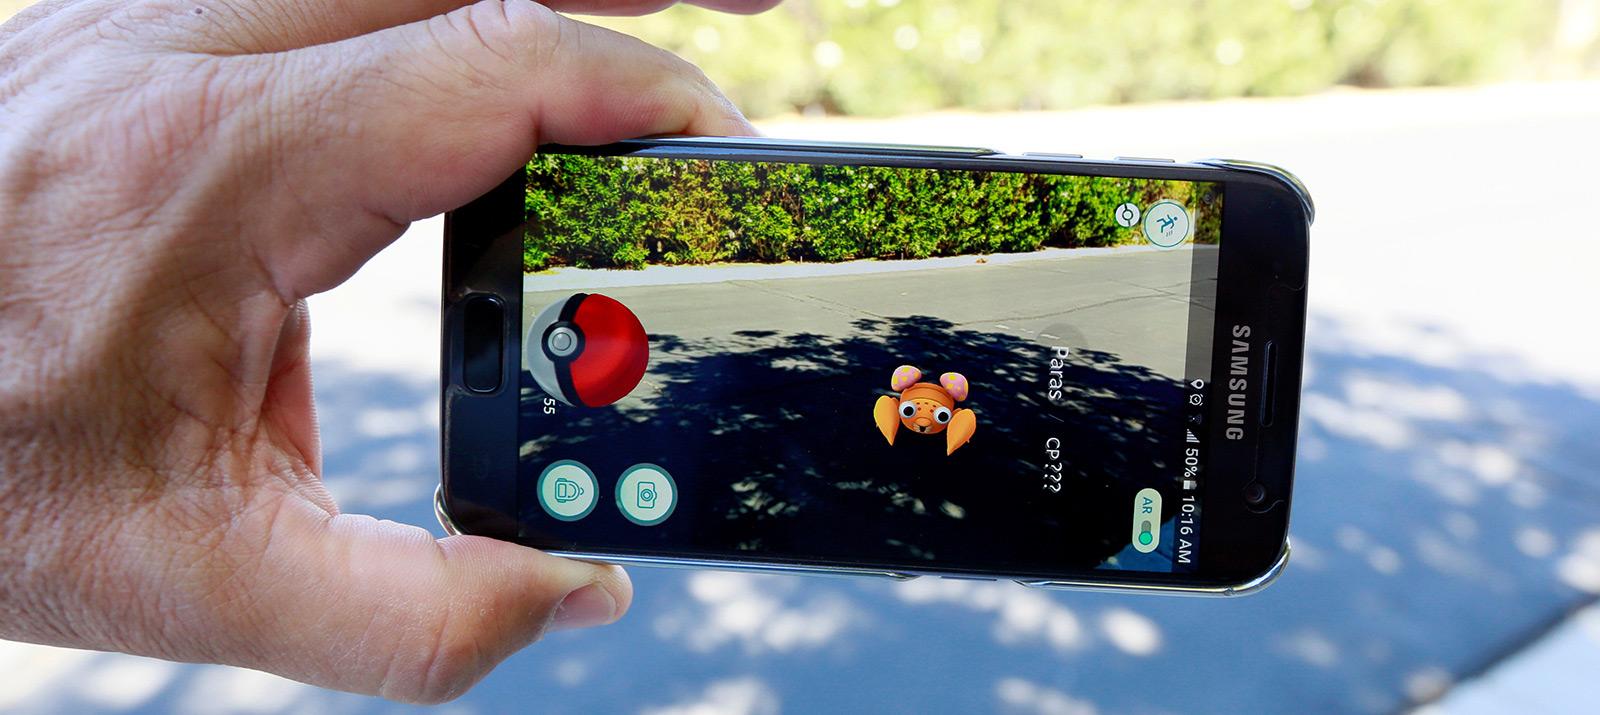 Игра Pokemon Go «убивает» водителей 1